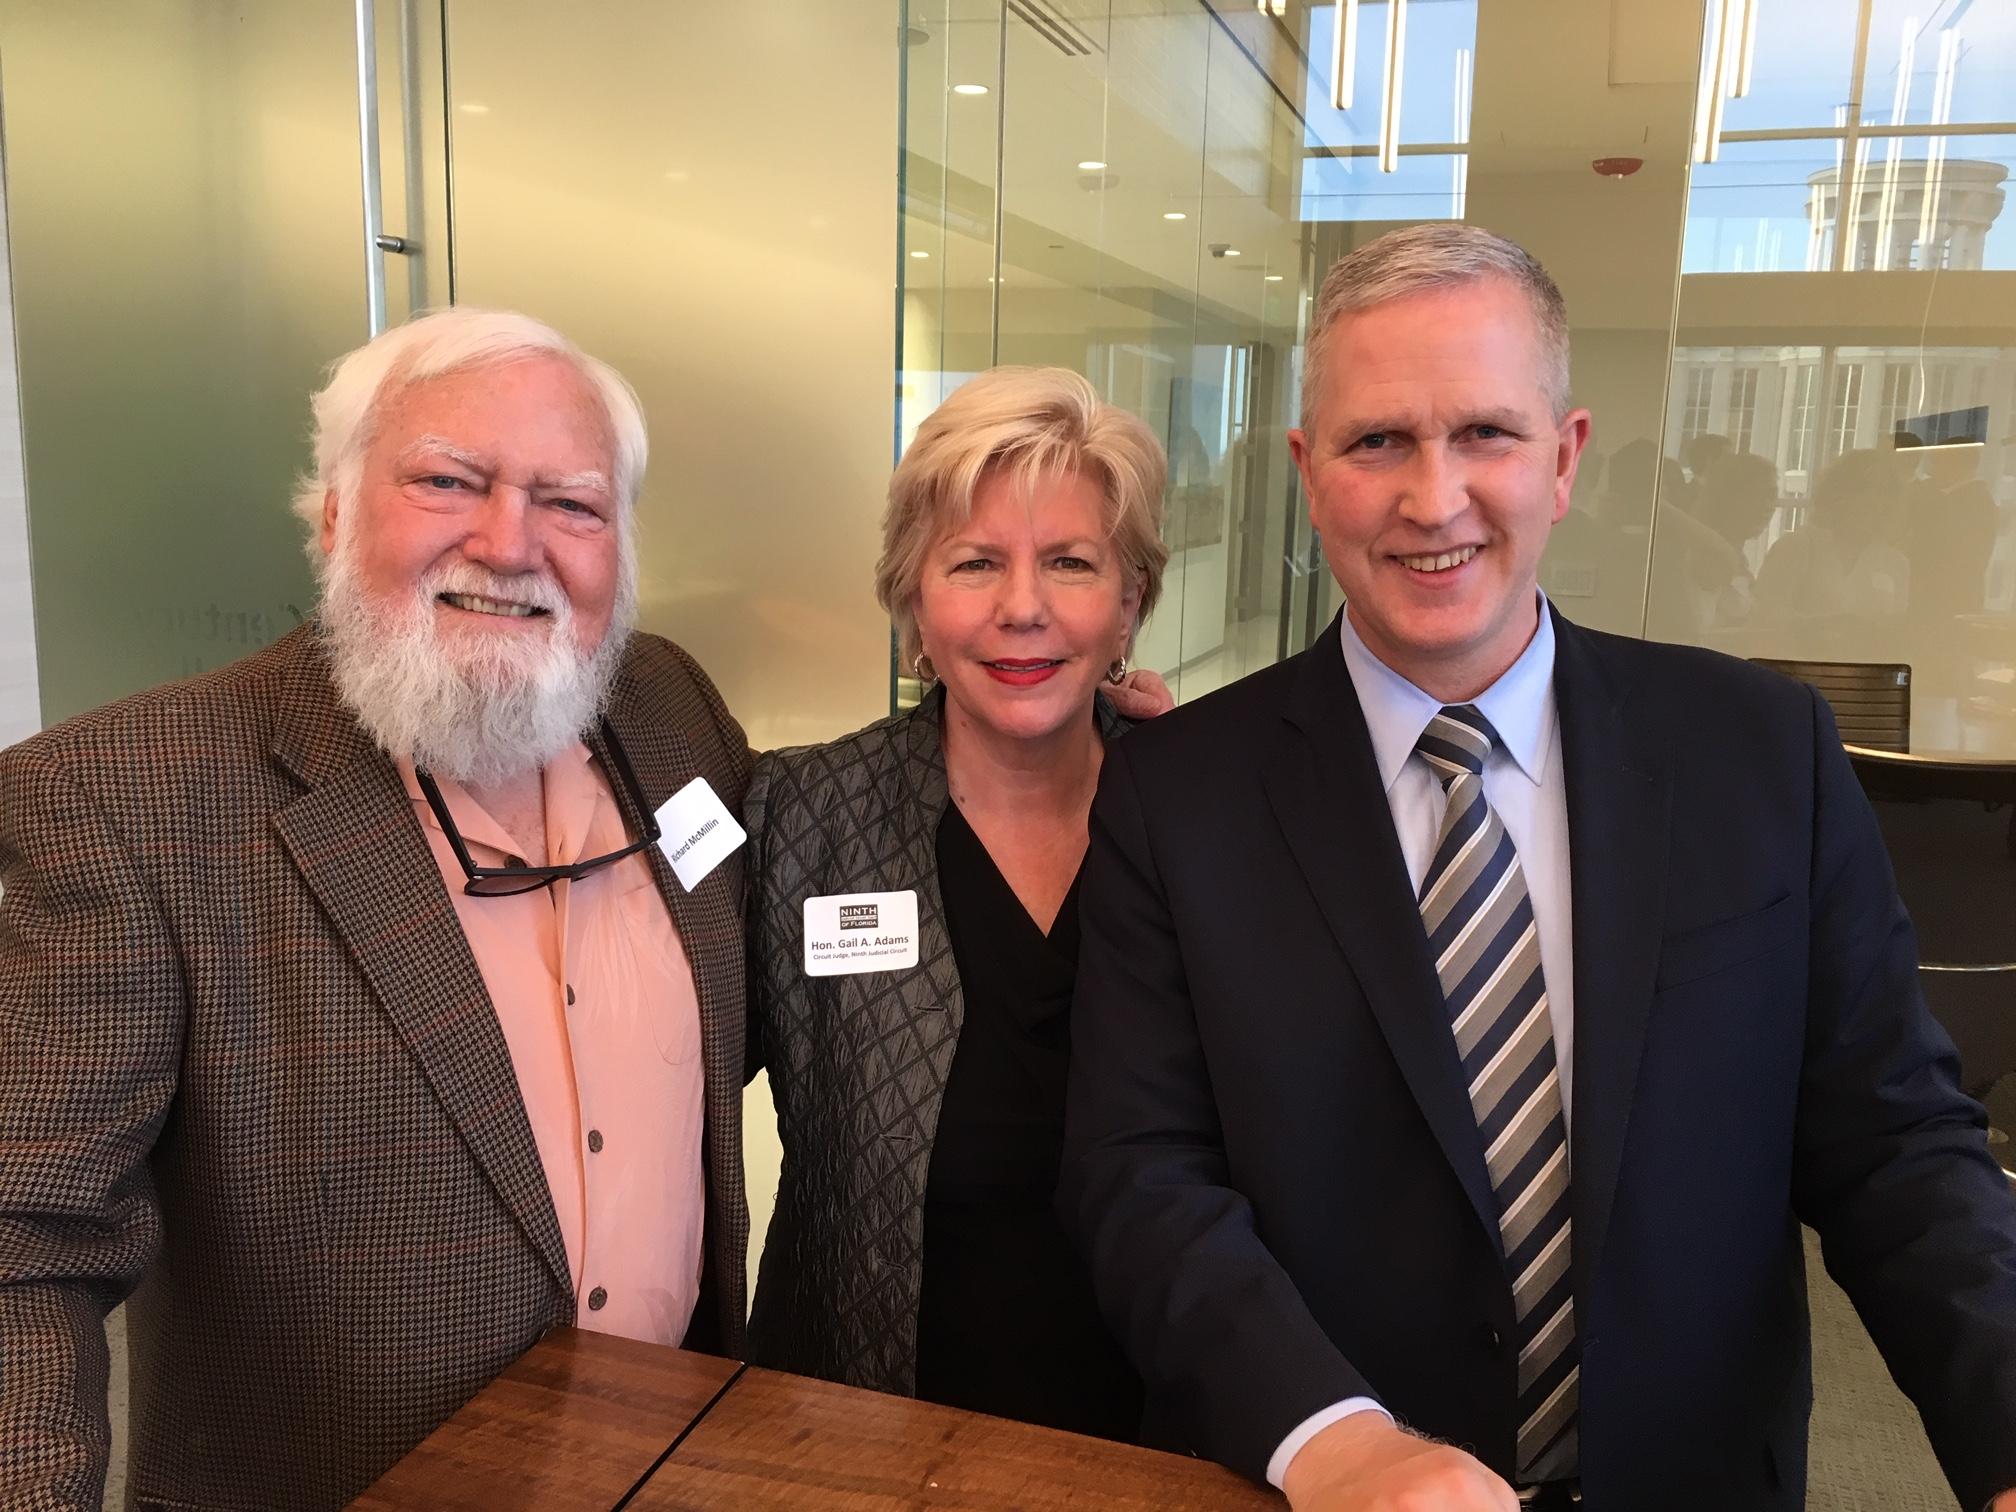 Richard McMillin, Judge Gail A. Adams, Edward O'Sheehan